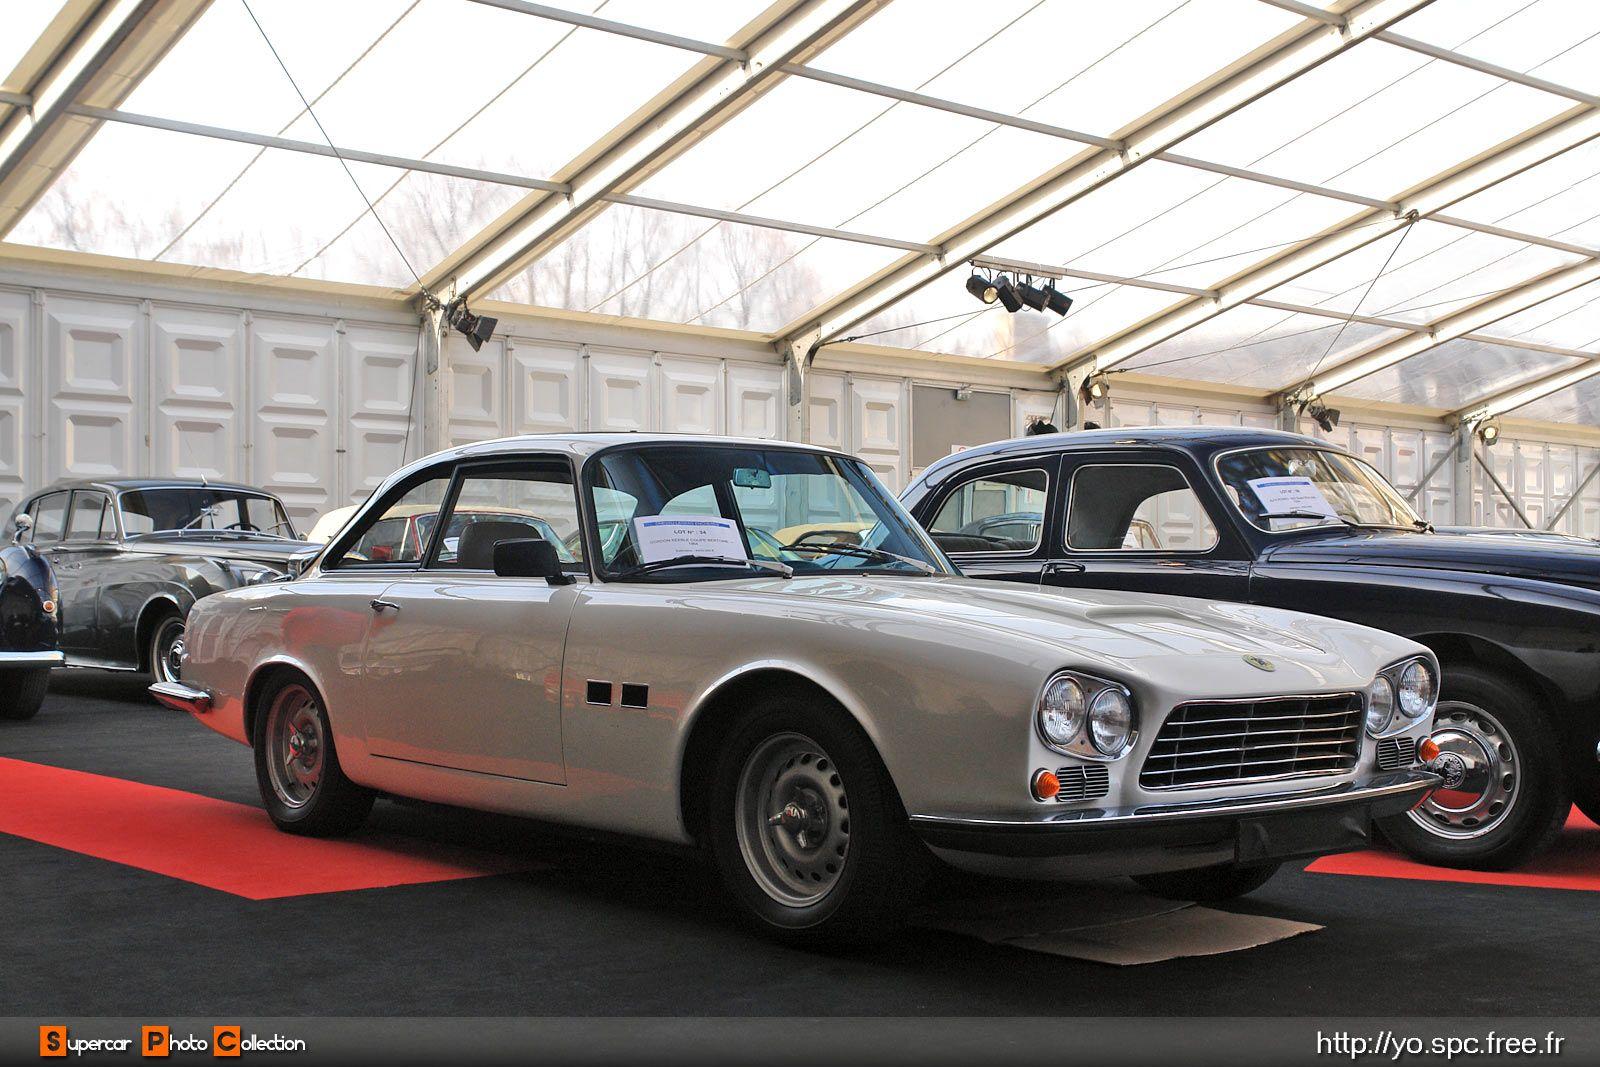 1964 Gordon Keeble GK1 | Top 10 Car List | Pinterest | Cars